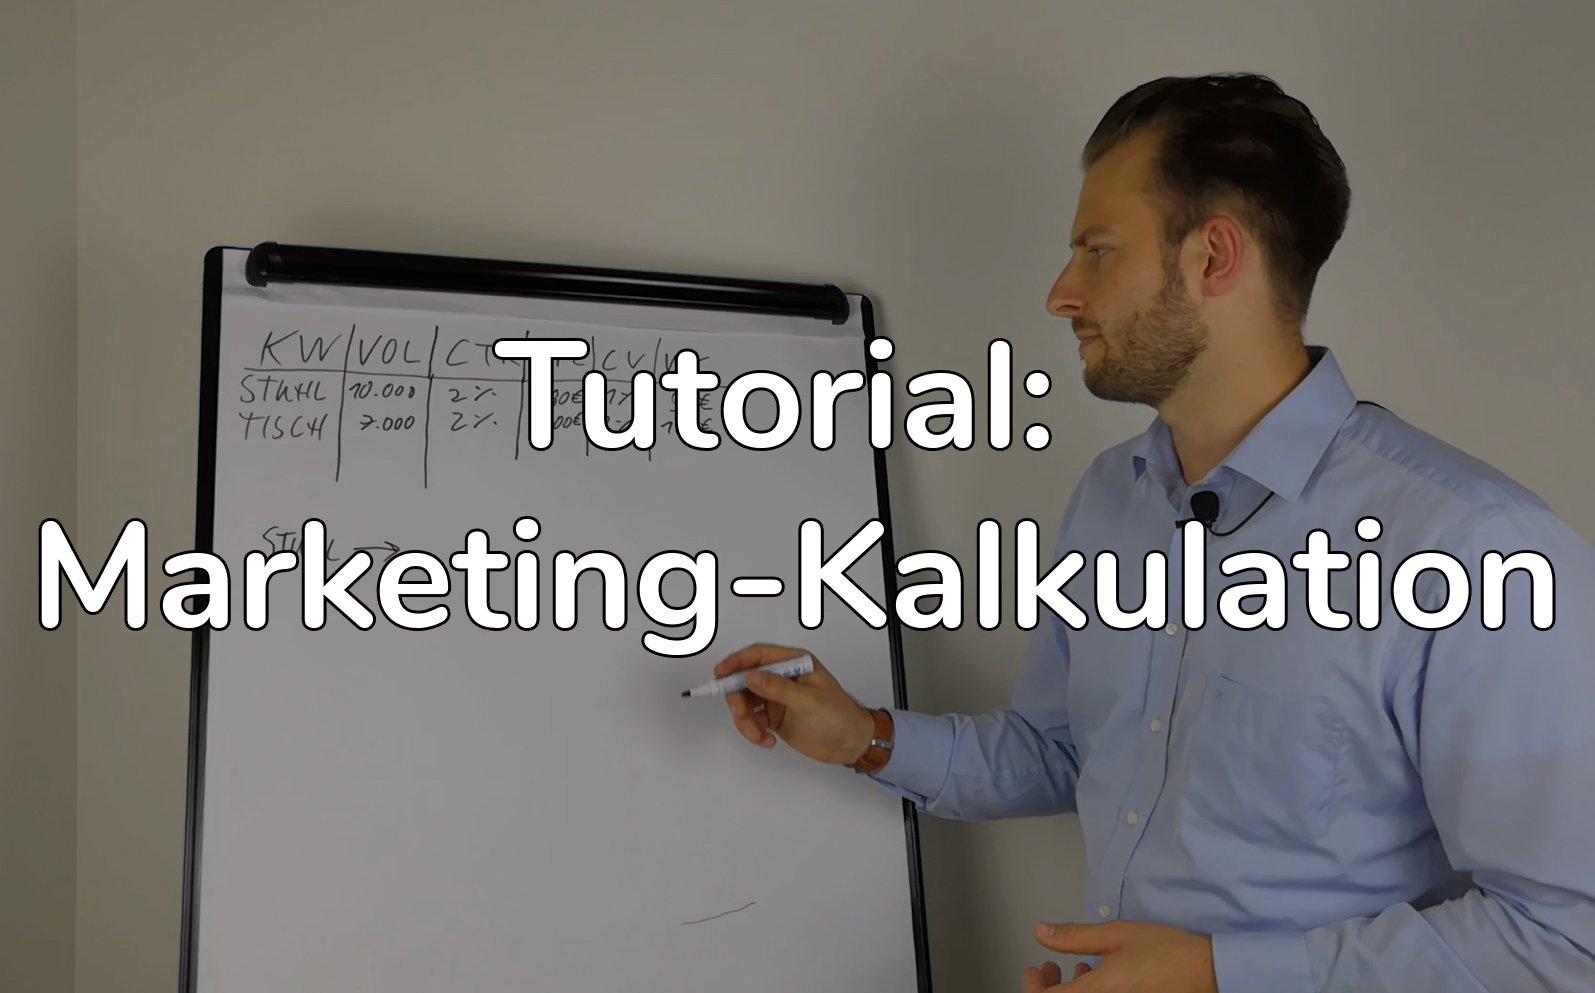 Marketing Kalkulation Tutorial